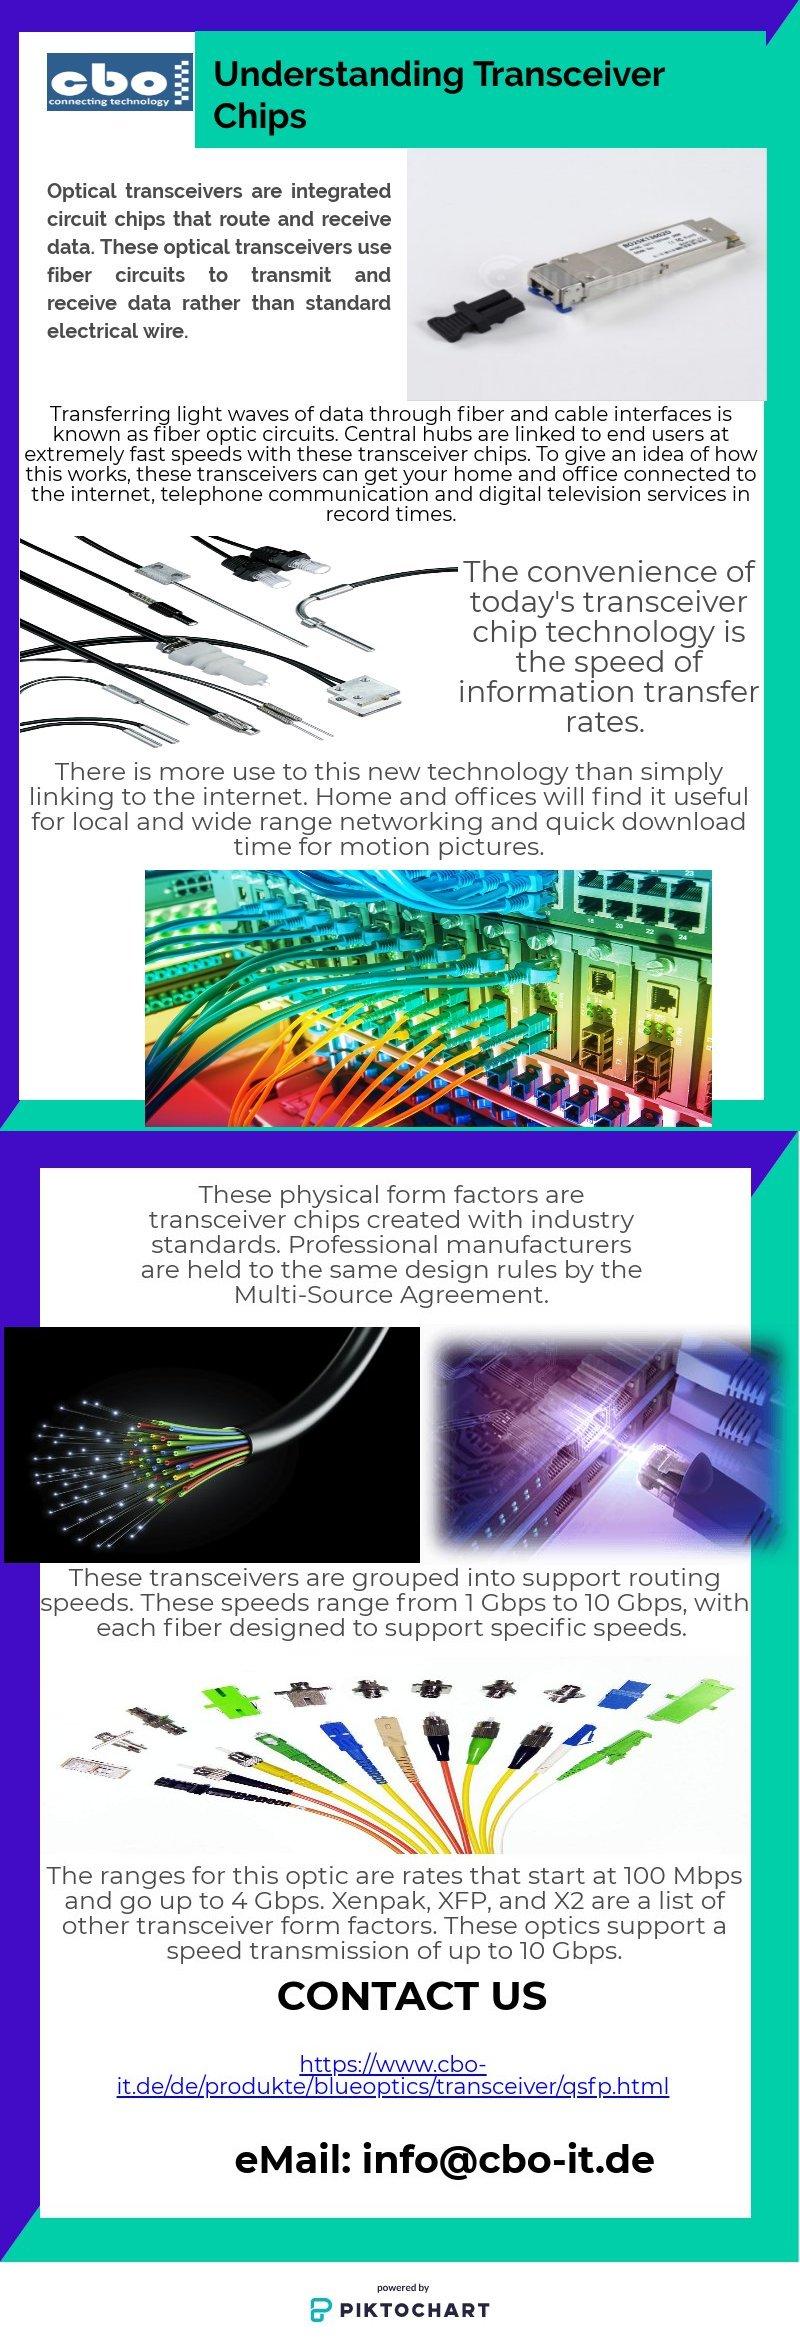 understanding transceiver chips piktochart visual editor rh create piktochart com